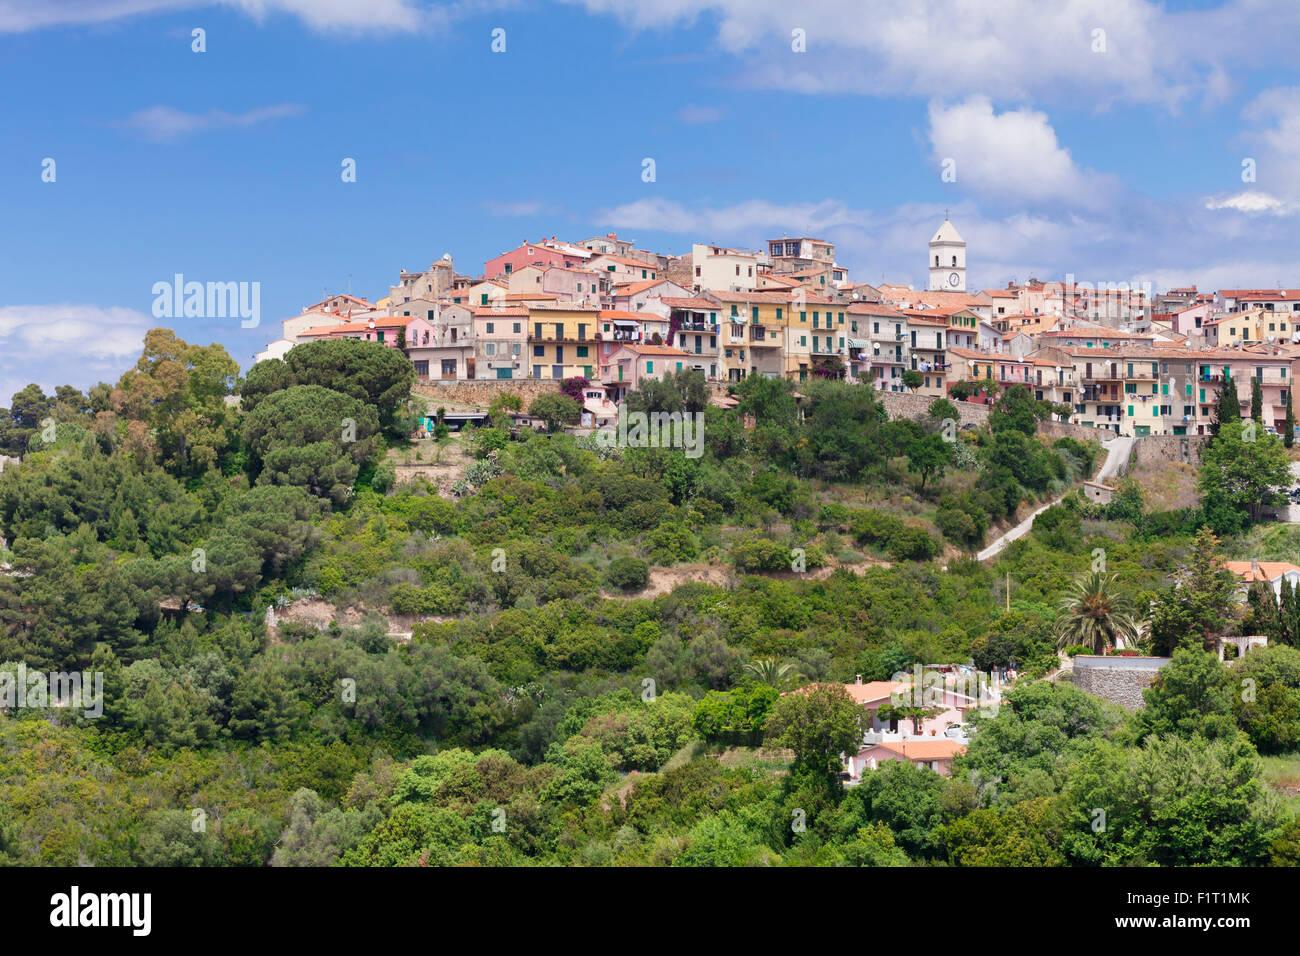 Capoliveri, Island of Elba, Livorno Province, Tuscany, Italy, Europe - Stock Image